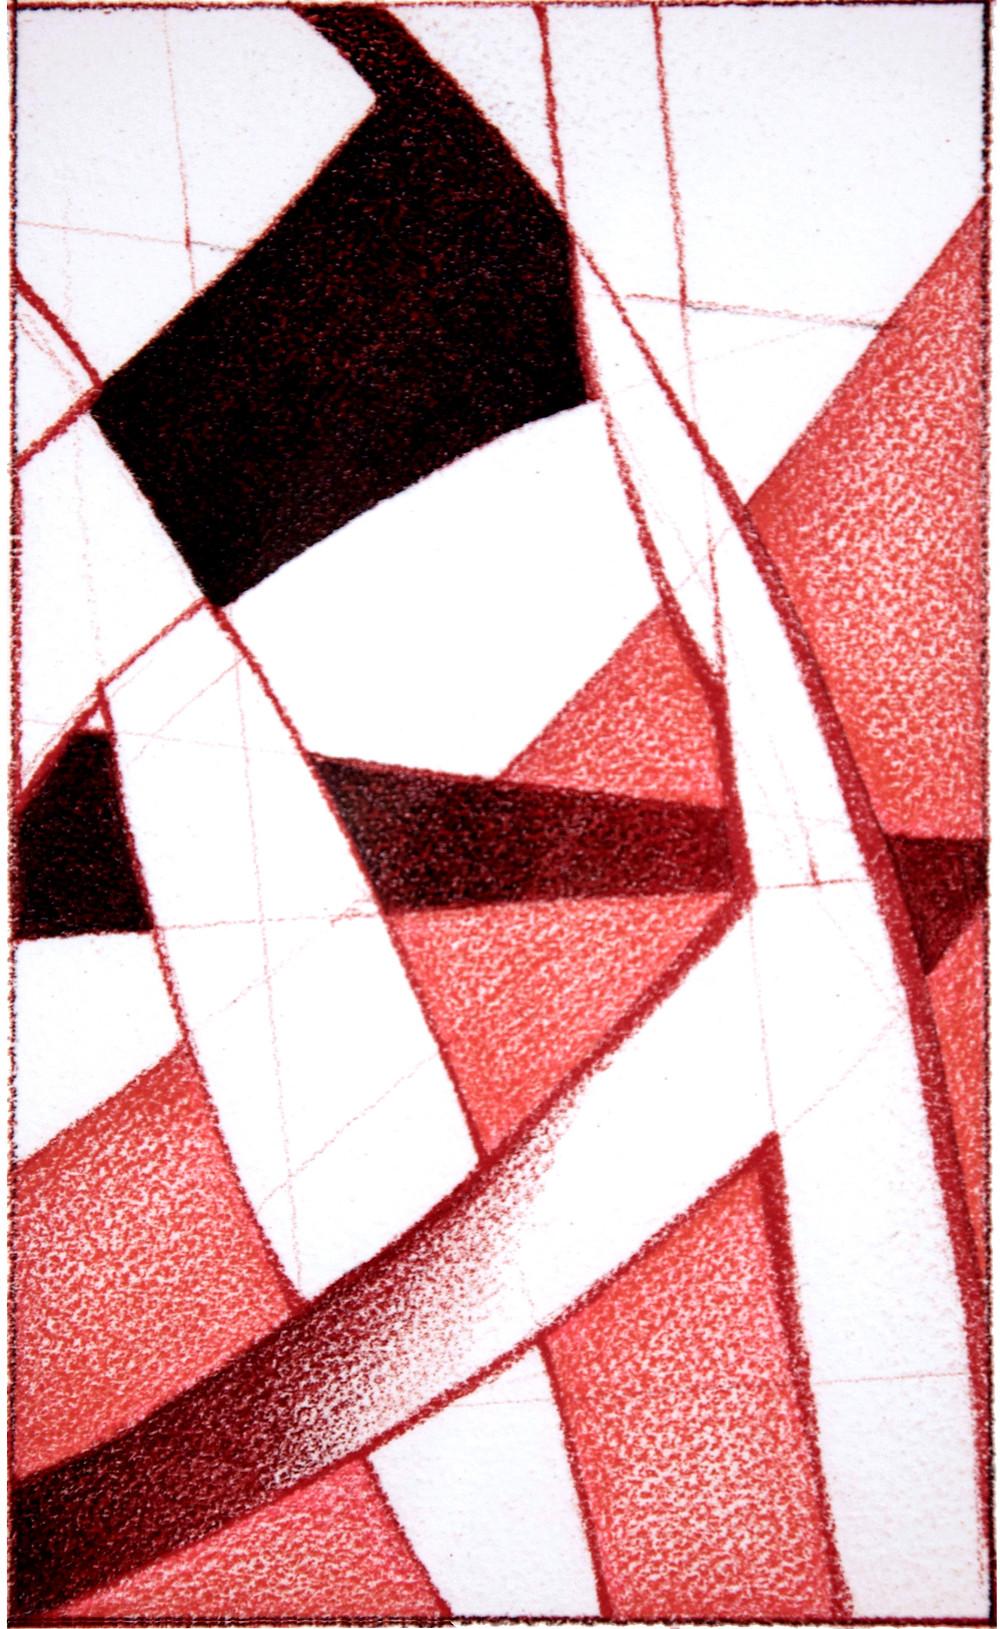 UA D CHINA_RED.2.9.98_72 copy.JPG